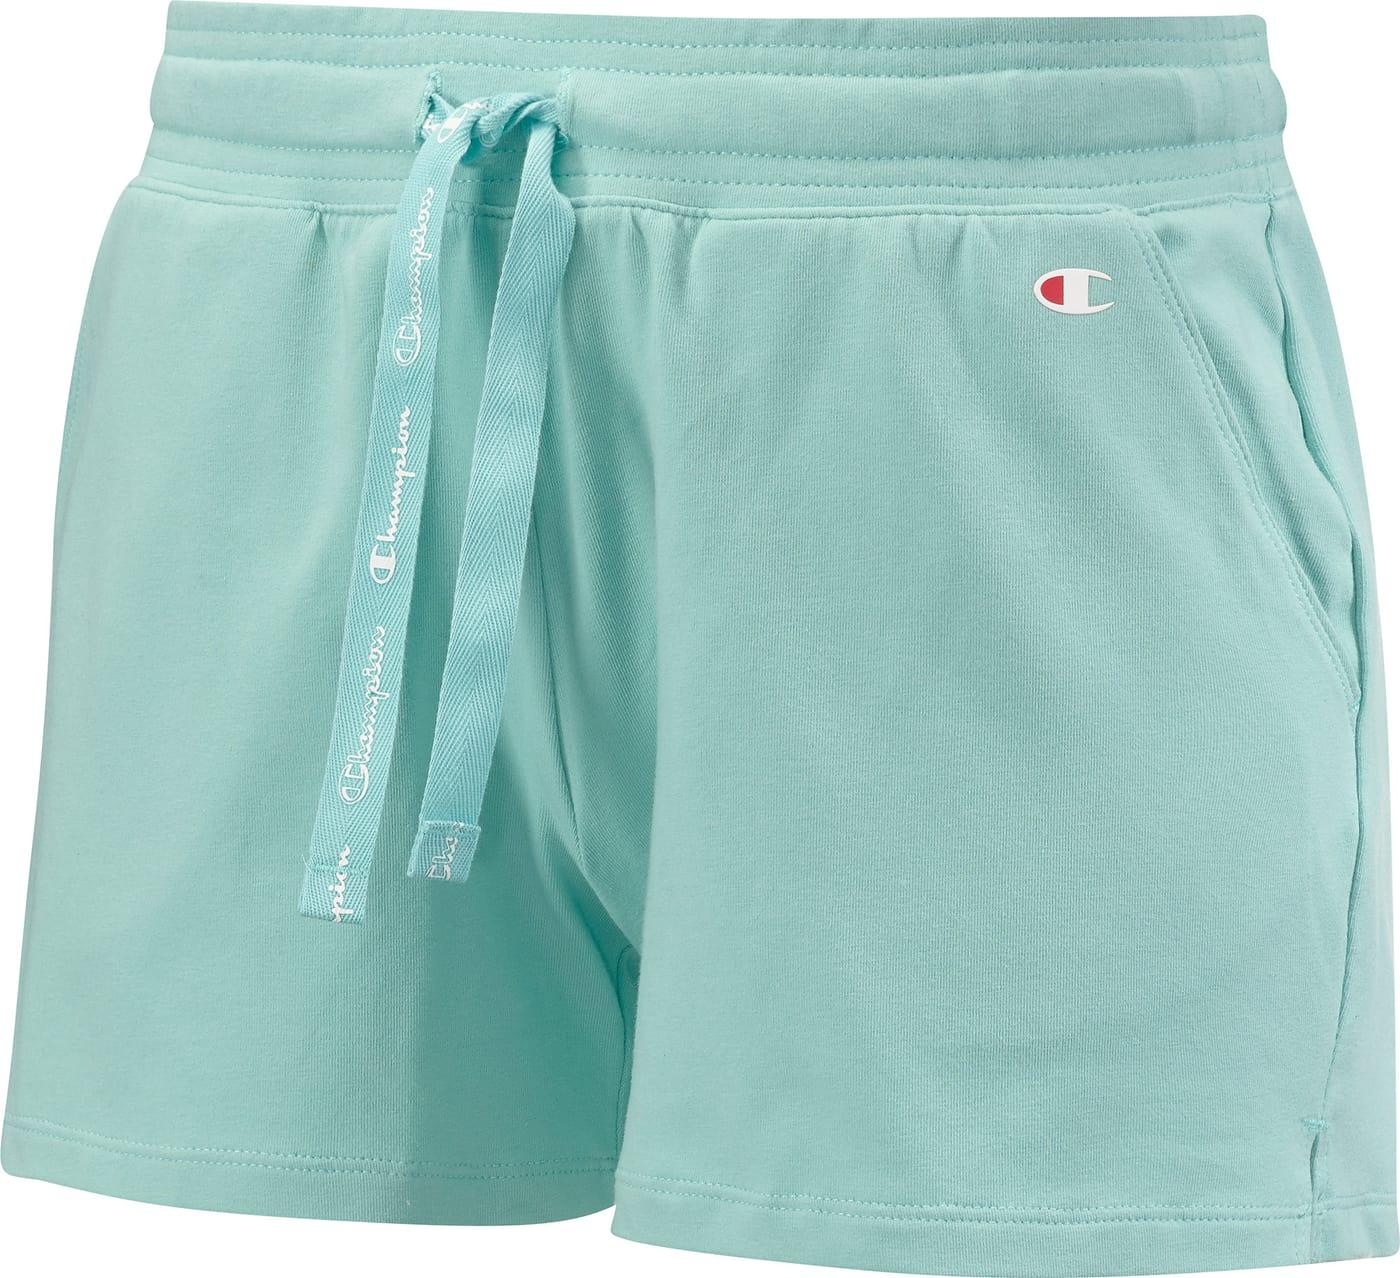 enorme sconto 791e9 bf686 Champion Legacy Women Shorts Pantaloncini da donna